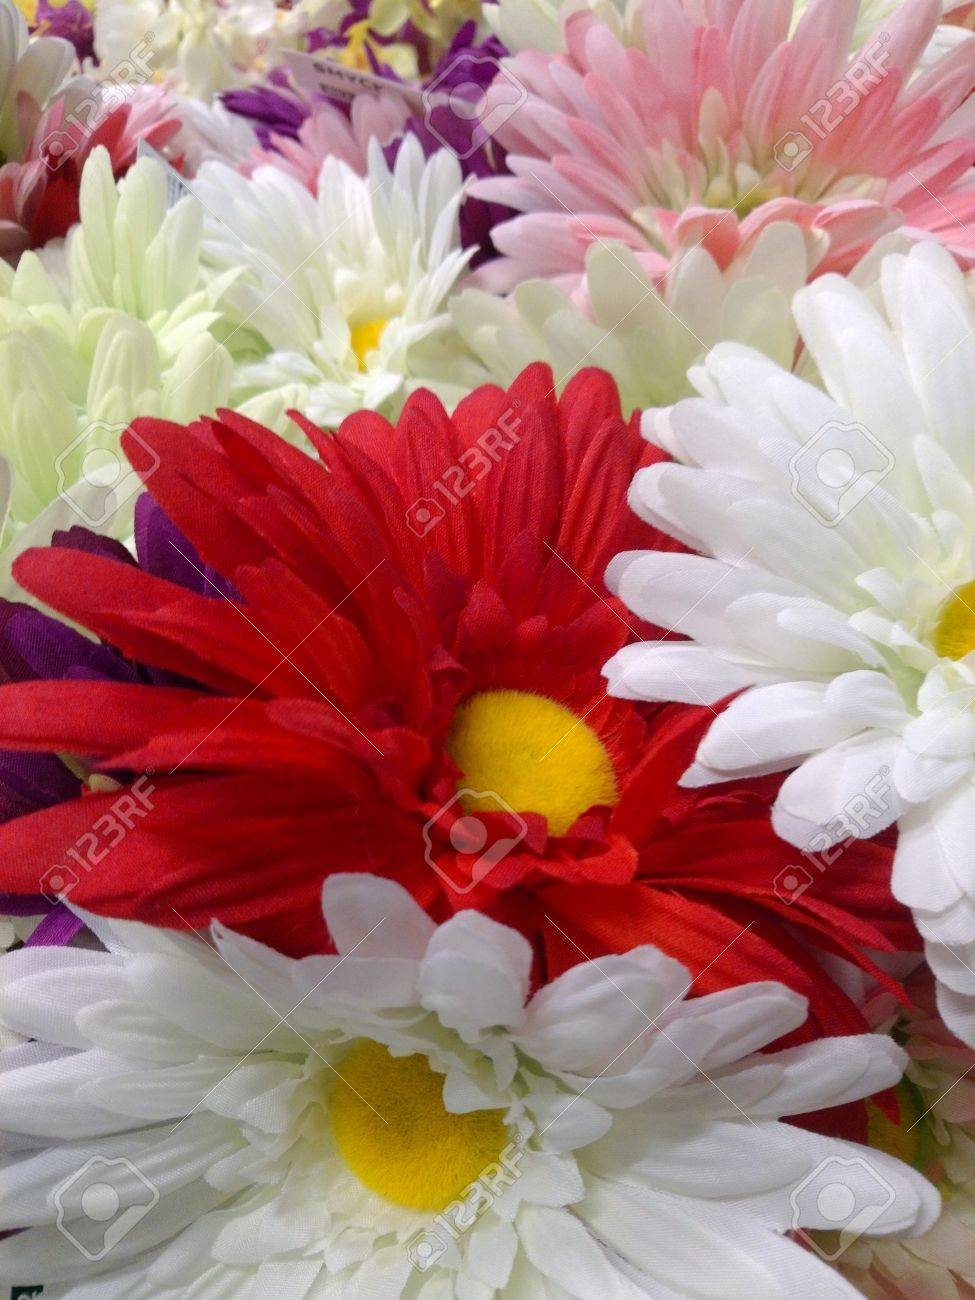 Beautiful fake flowers stock photo picture and royalty free image beautiful fake flowers stock photo 18822237 izmirmasajfo Choice Image